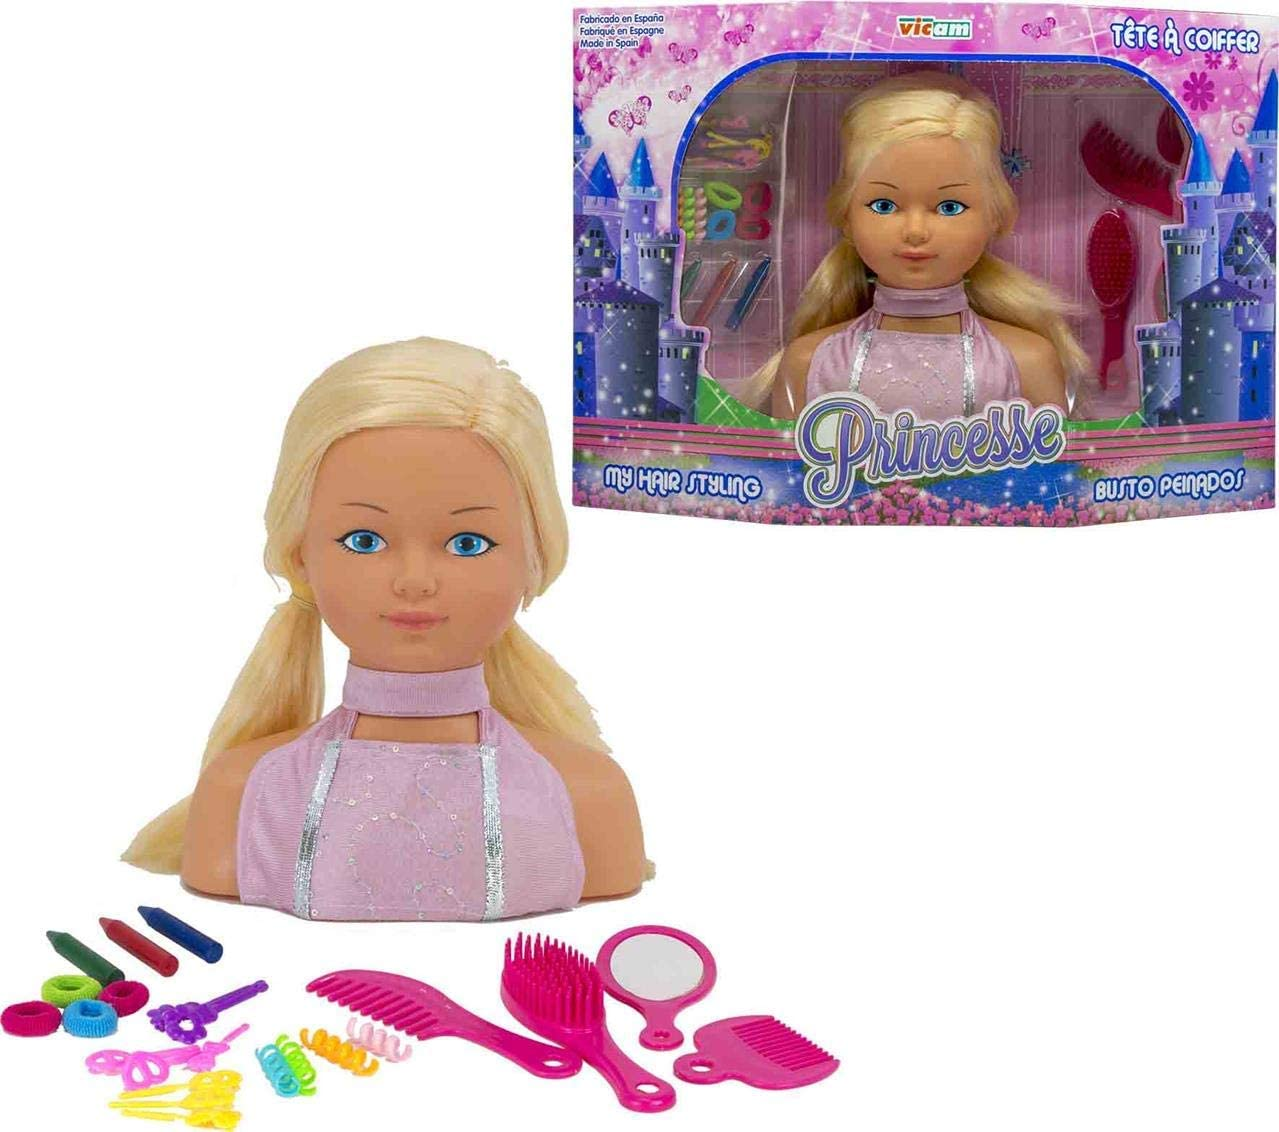 DRIM DISCOUNT Busto Princesse